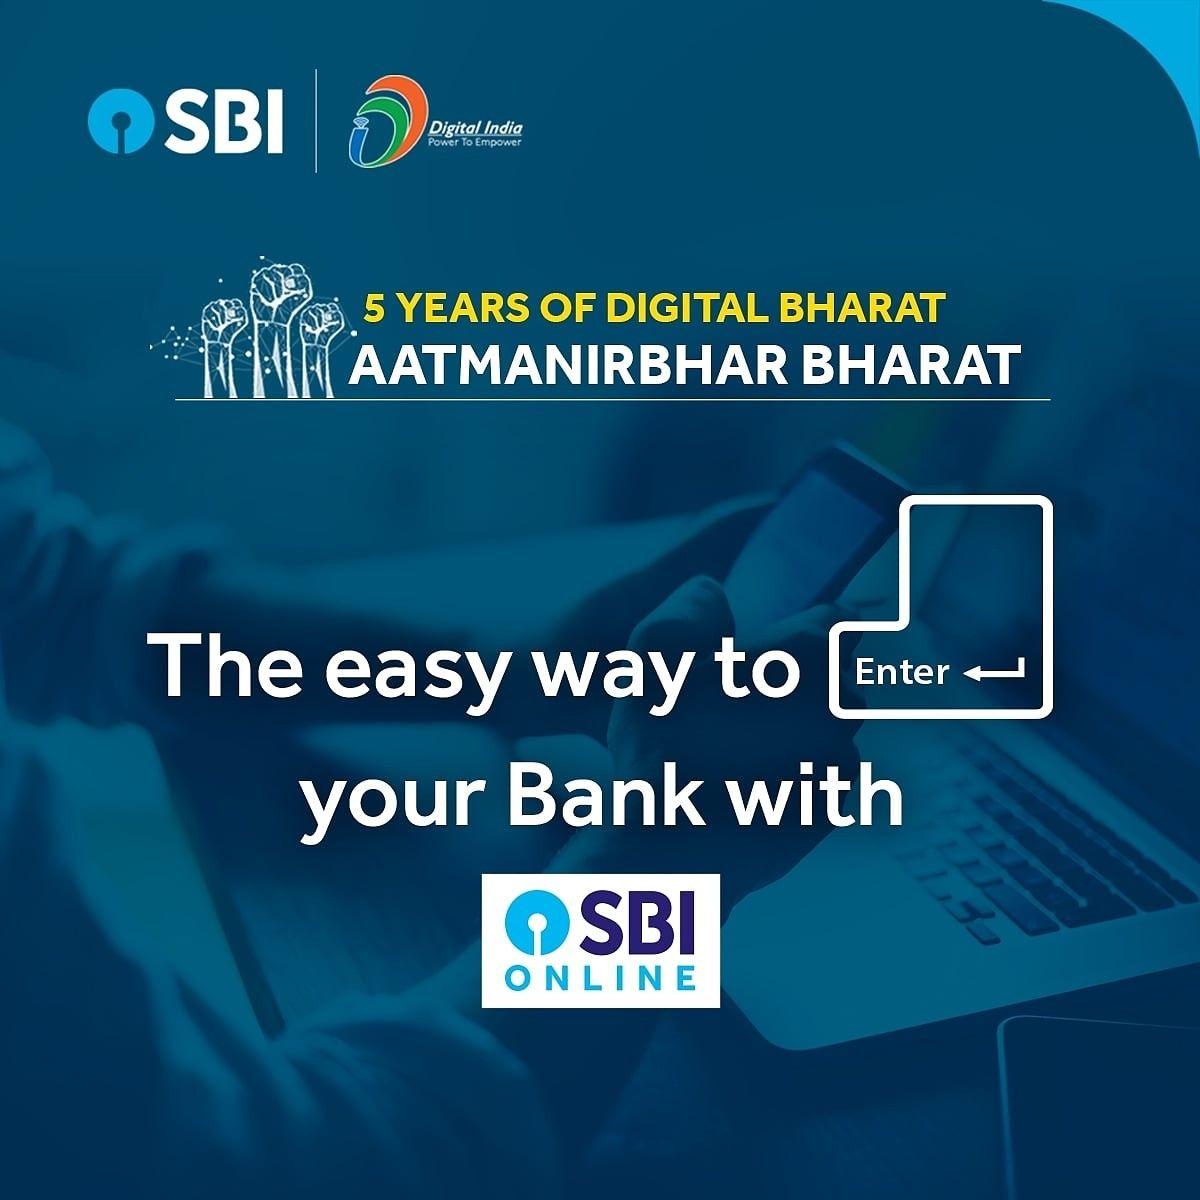 5 Years Of Digital Bharat In 2020 Digital Empowerment Announcement